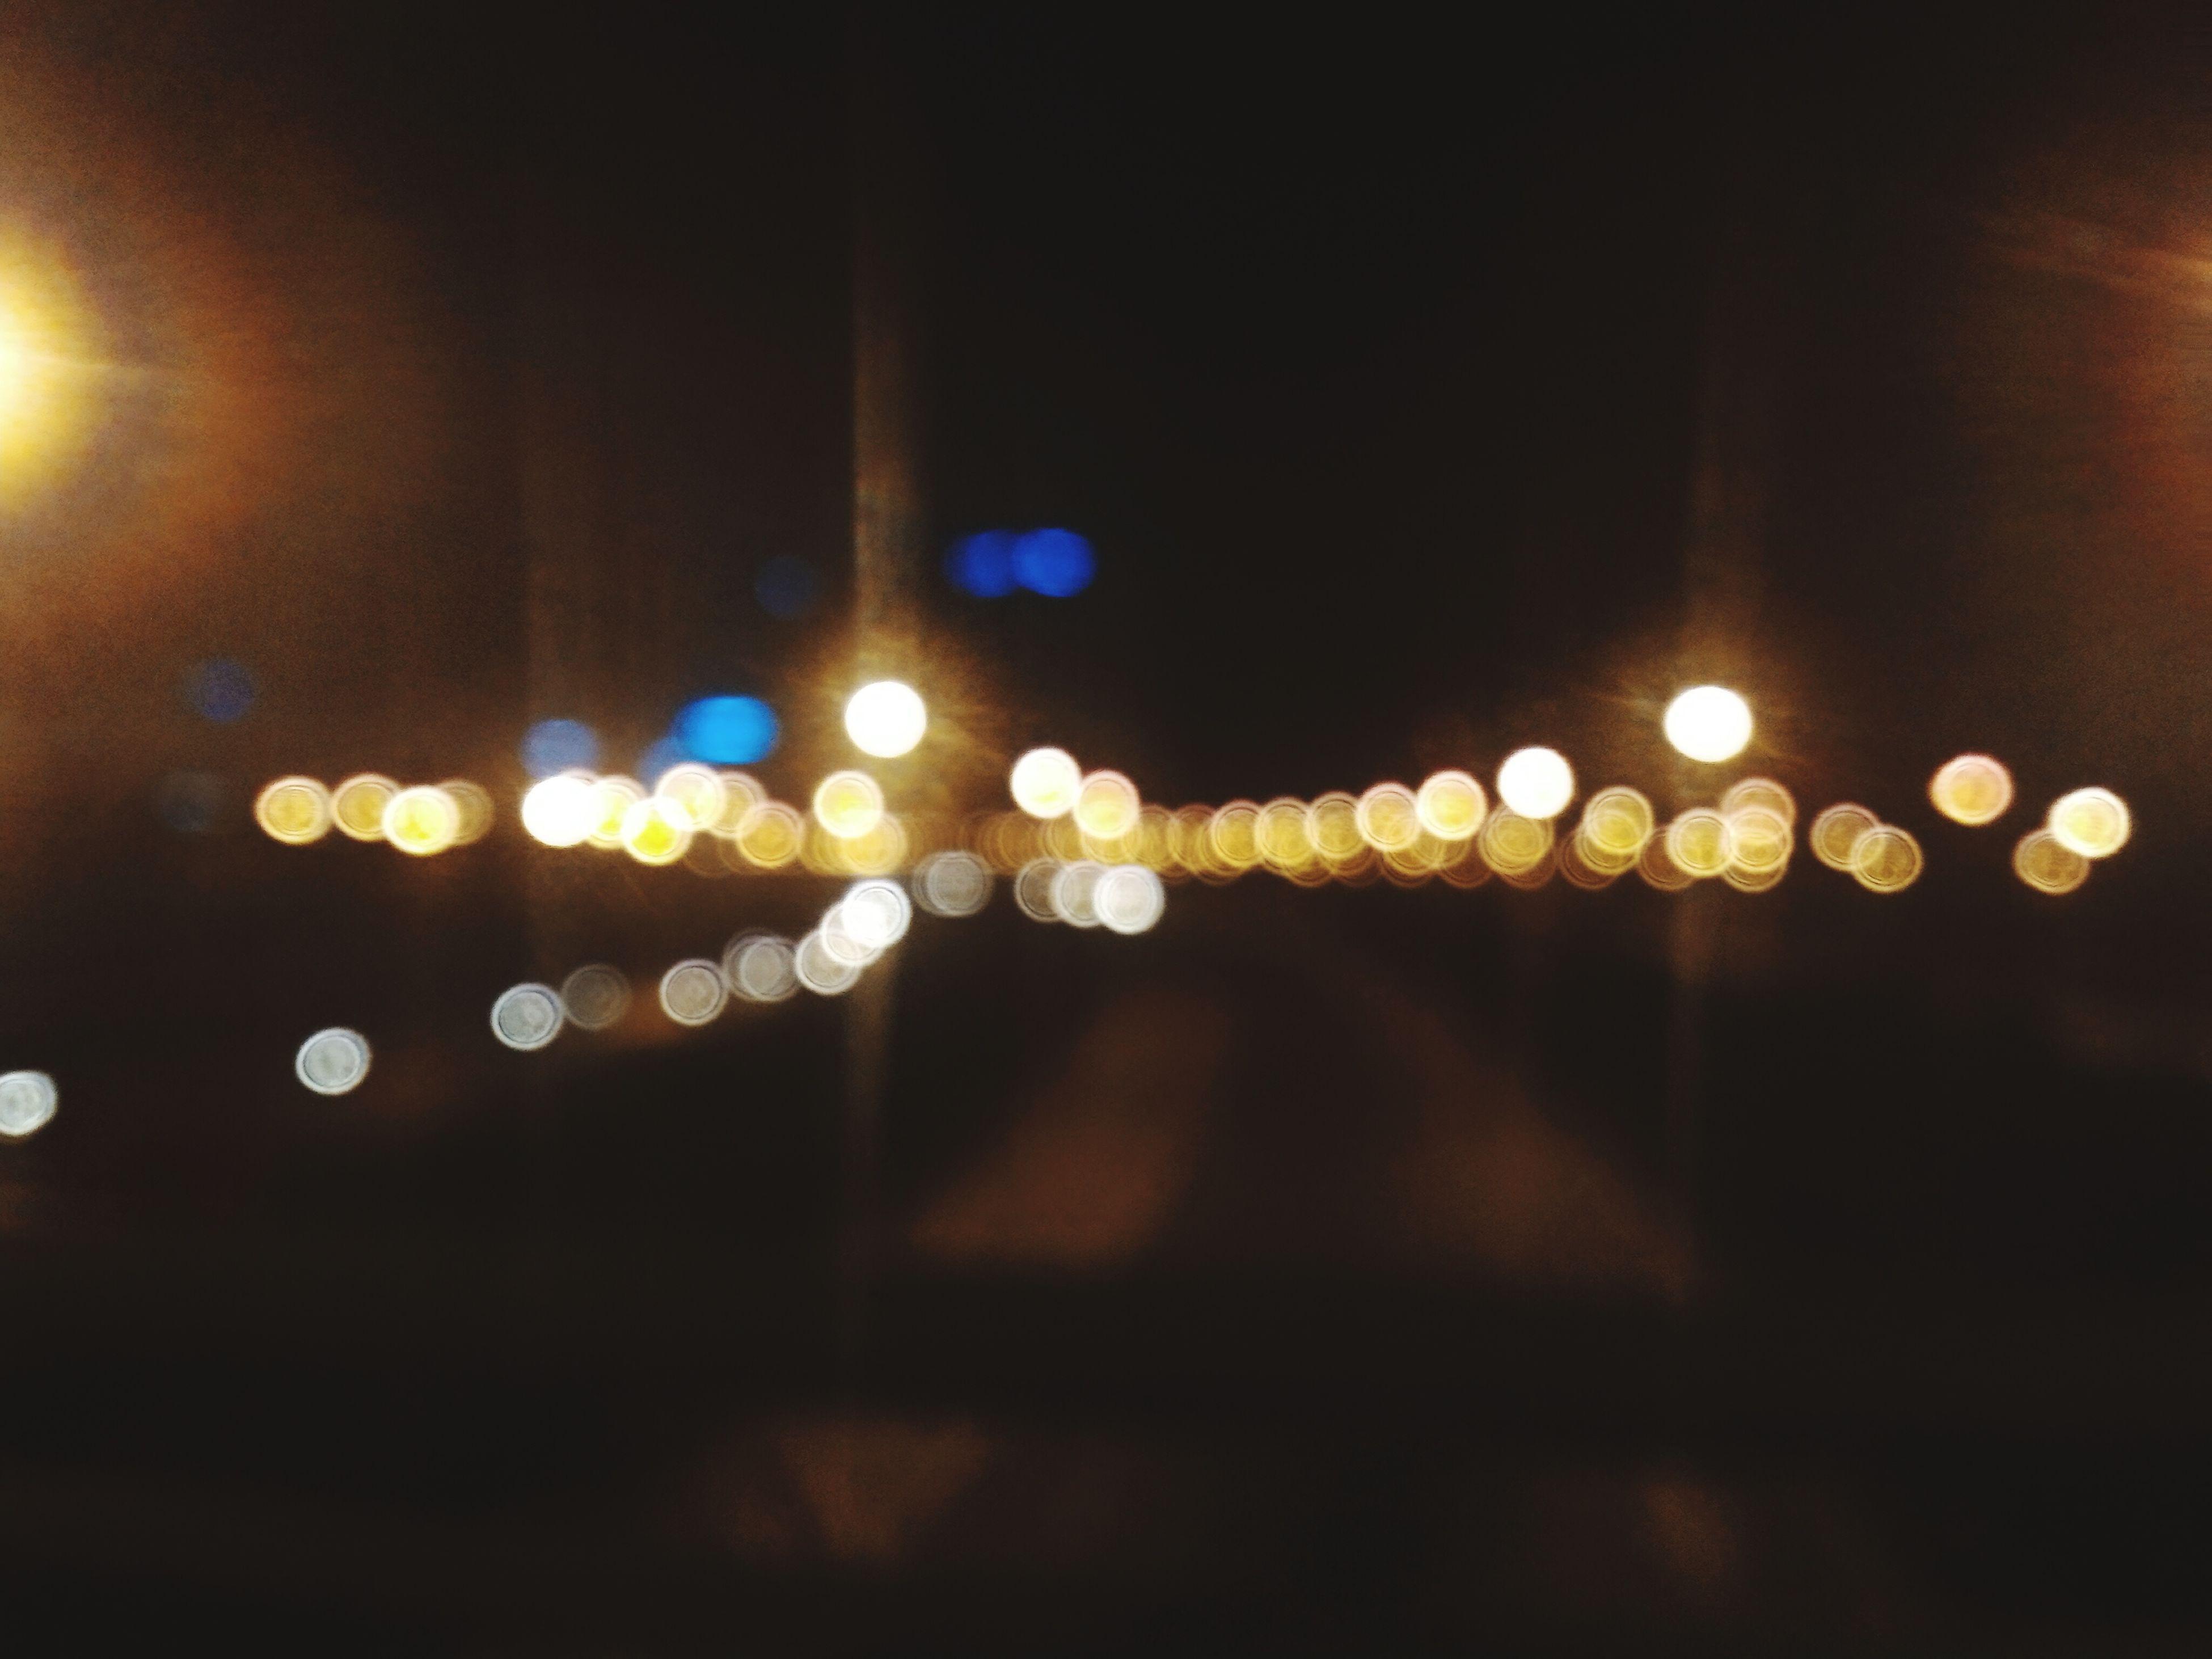 illuminated, night, lighting equipment, defocused, street light, light - natural phenomenon, city, street, architecture, built structure, glowing, lens flare, multi colored, electric light, transportation, building exterior, light, no people, indoors, window